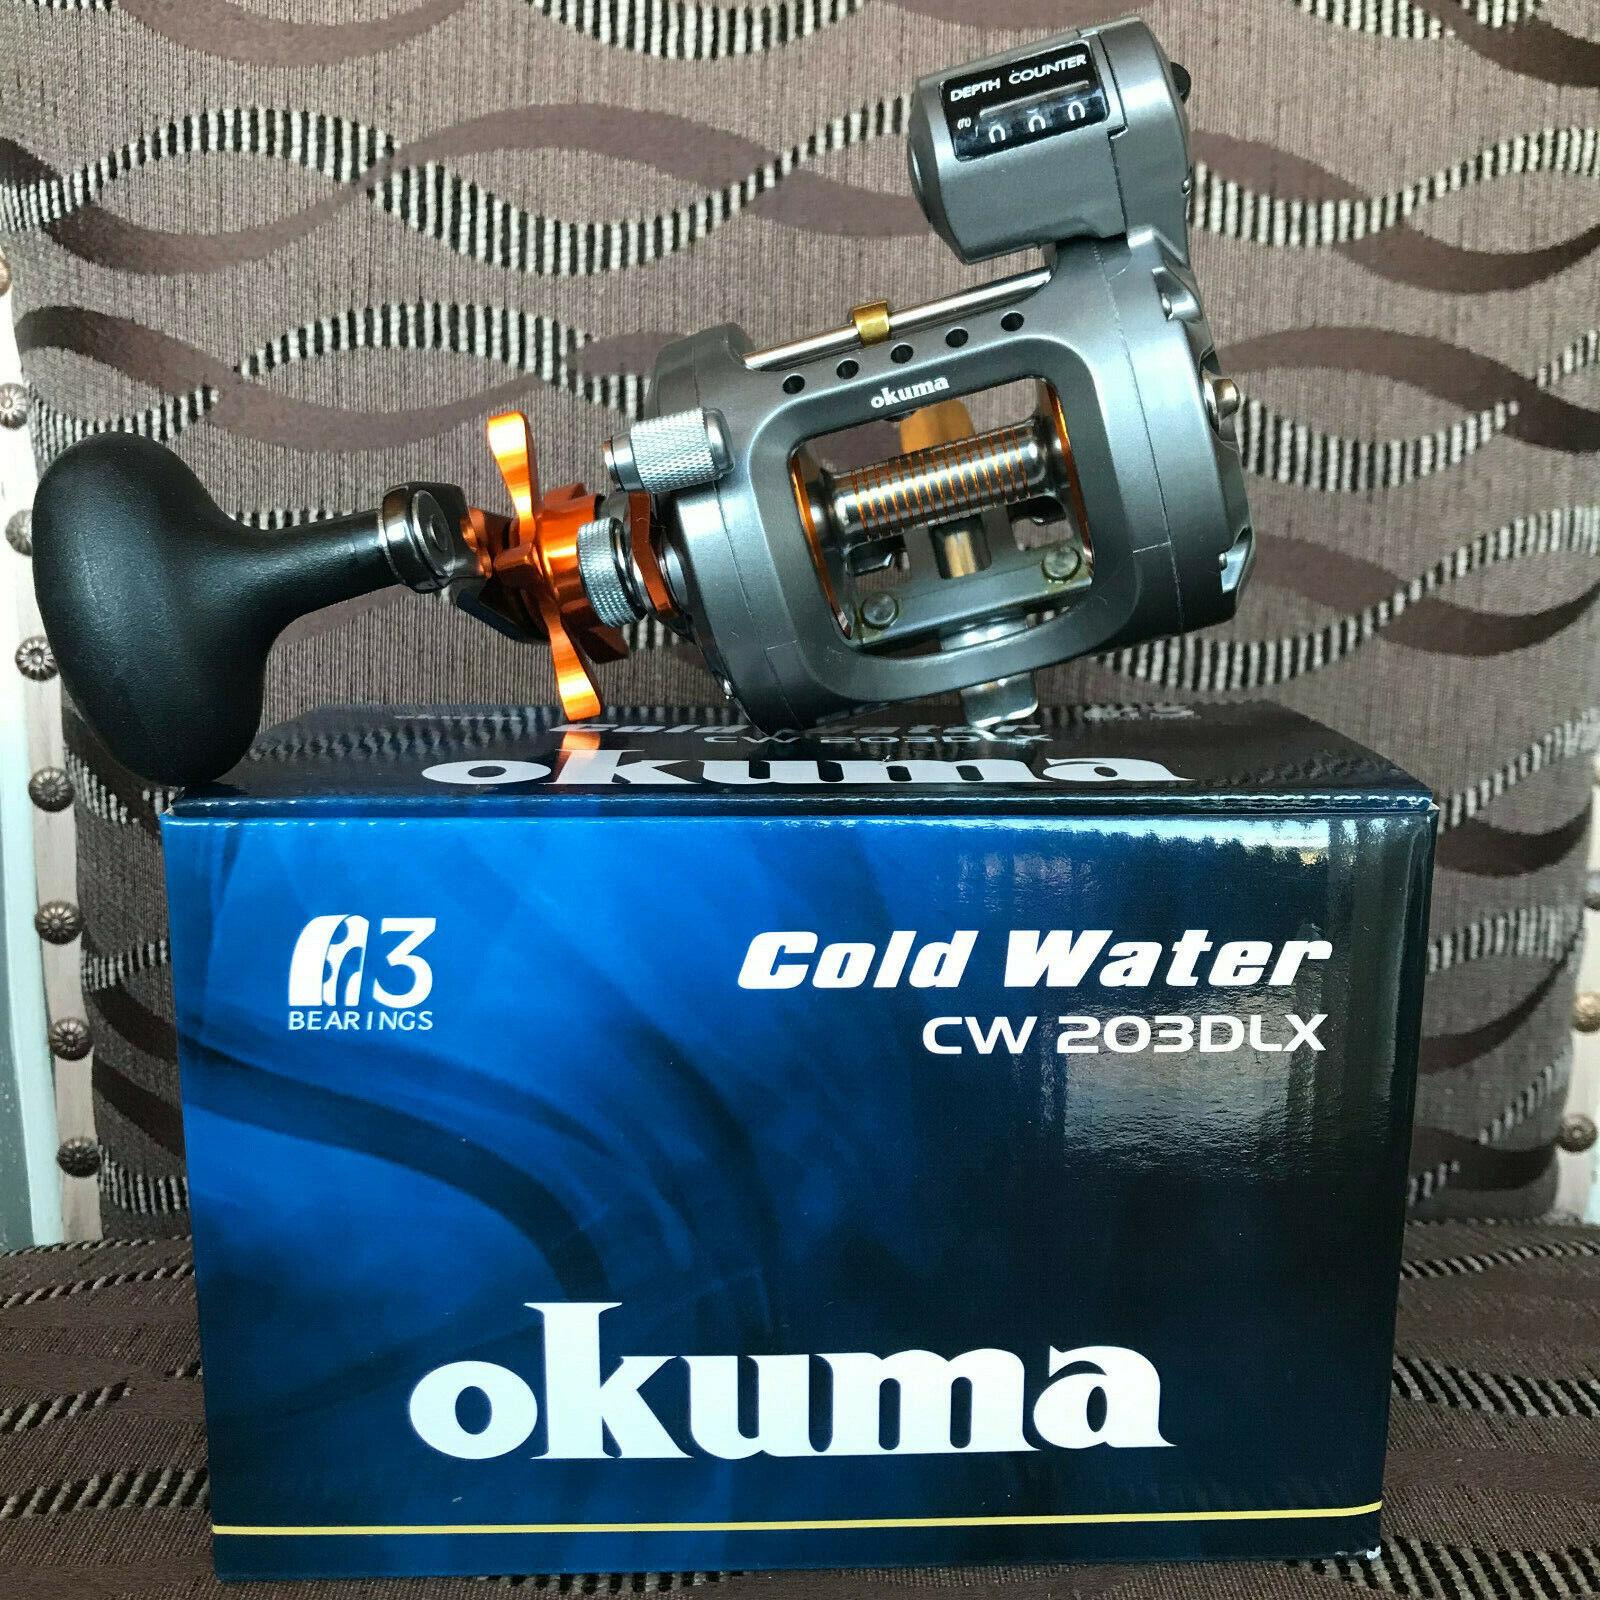 Okuma Cold Water CW-203DLX Linkshand Multirolle